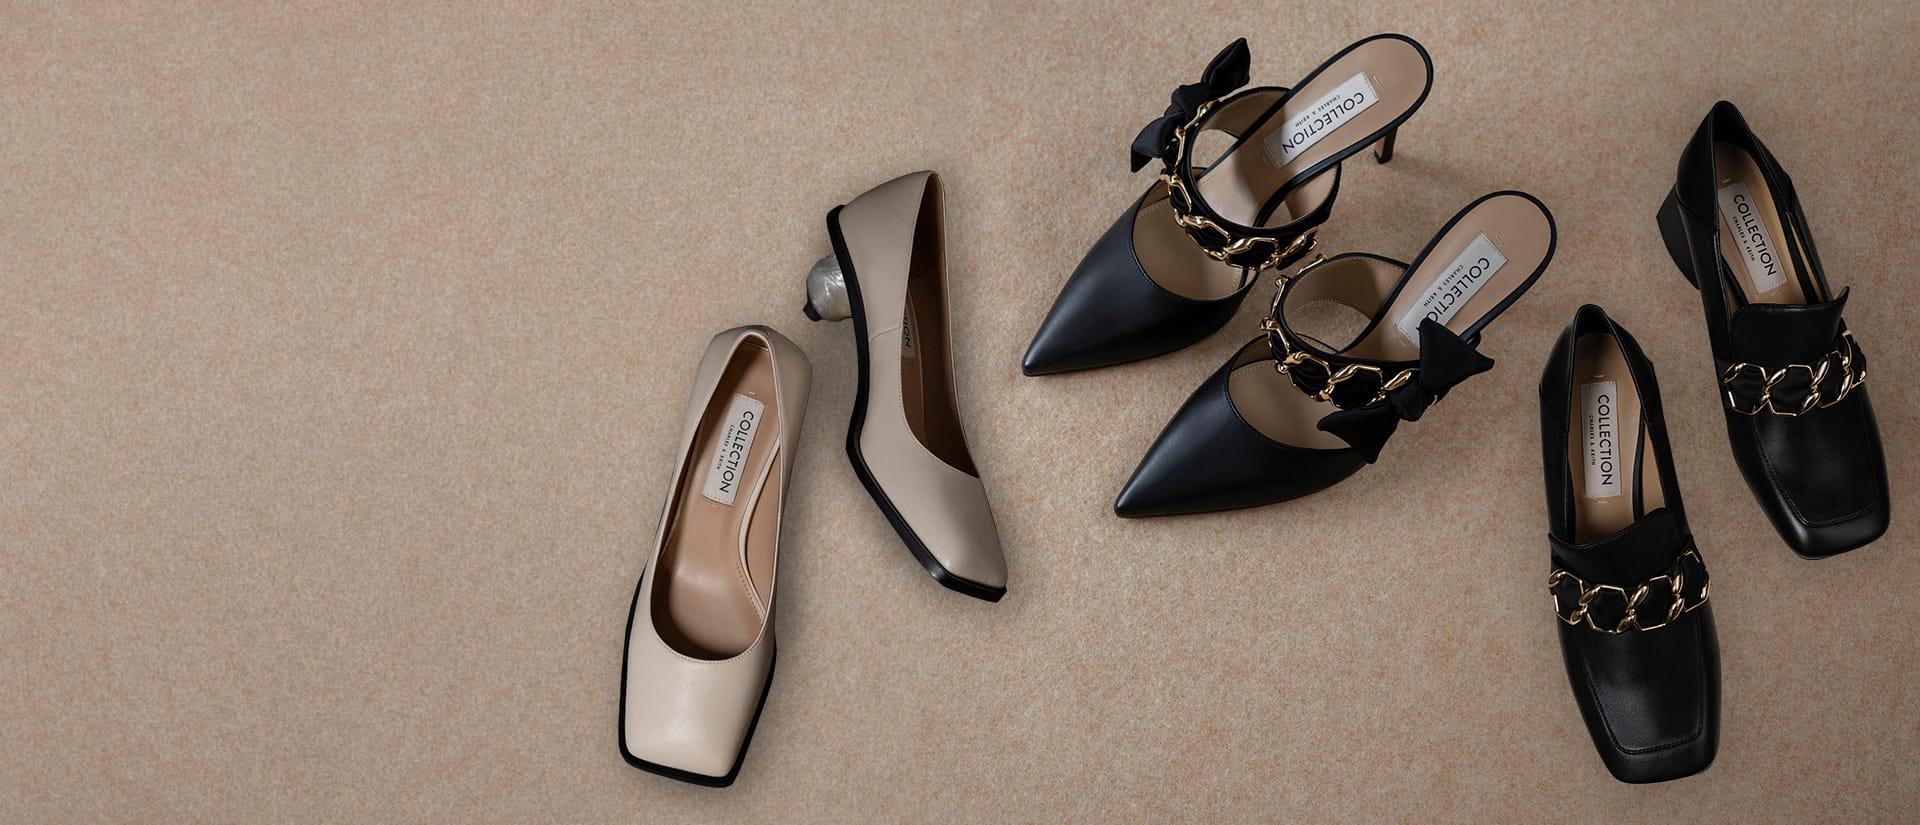 Women's sculptural heel pumps (kid leather) in beige - CHARLES & KEITH